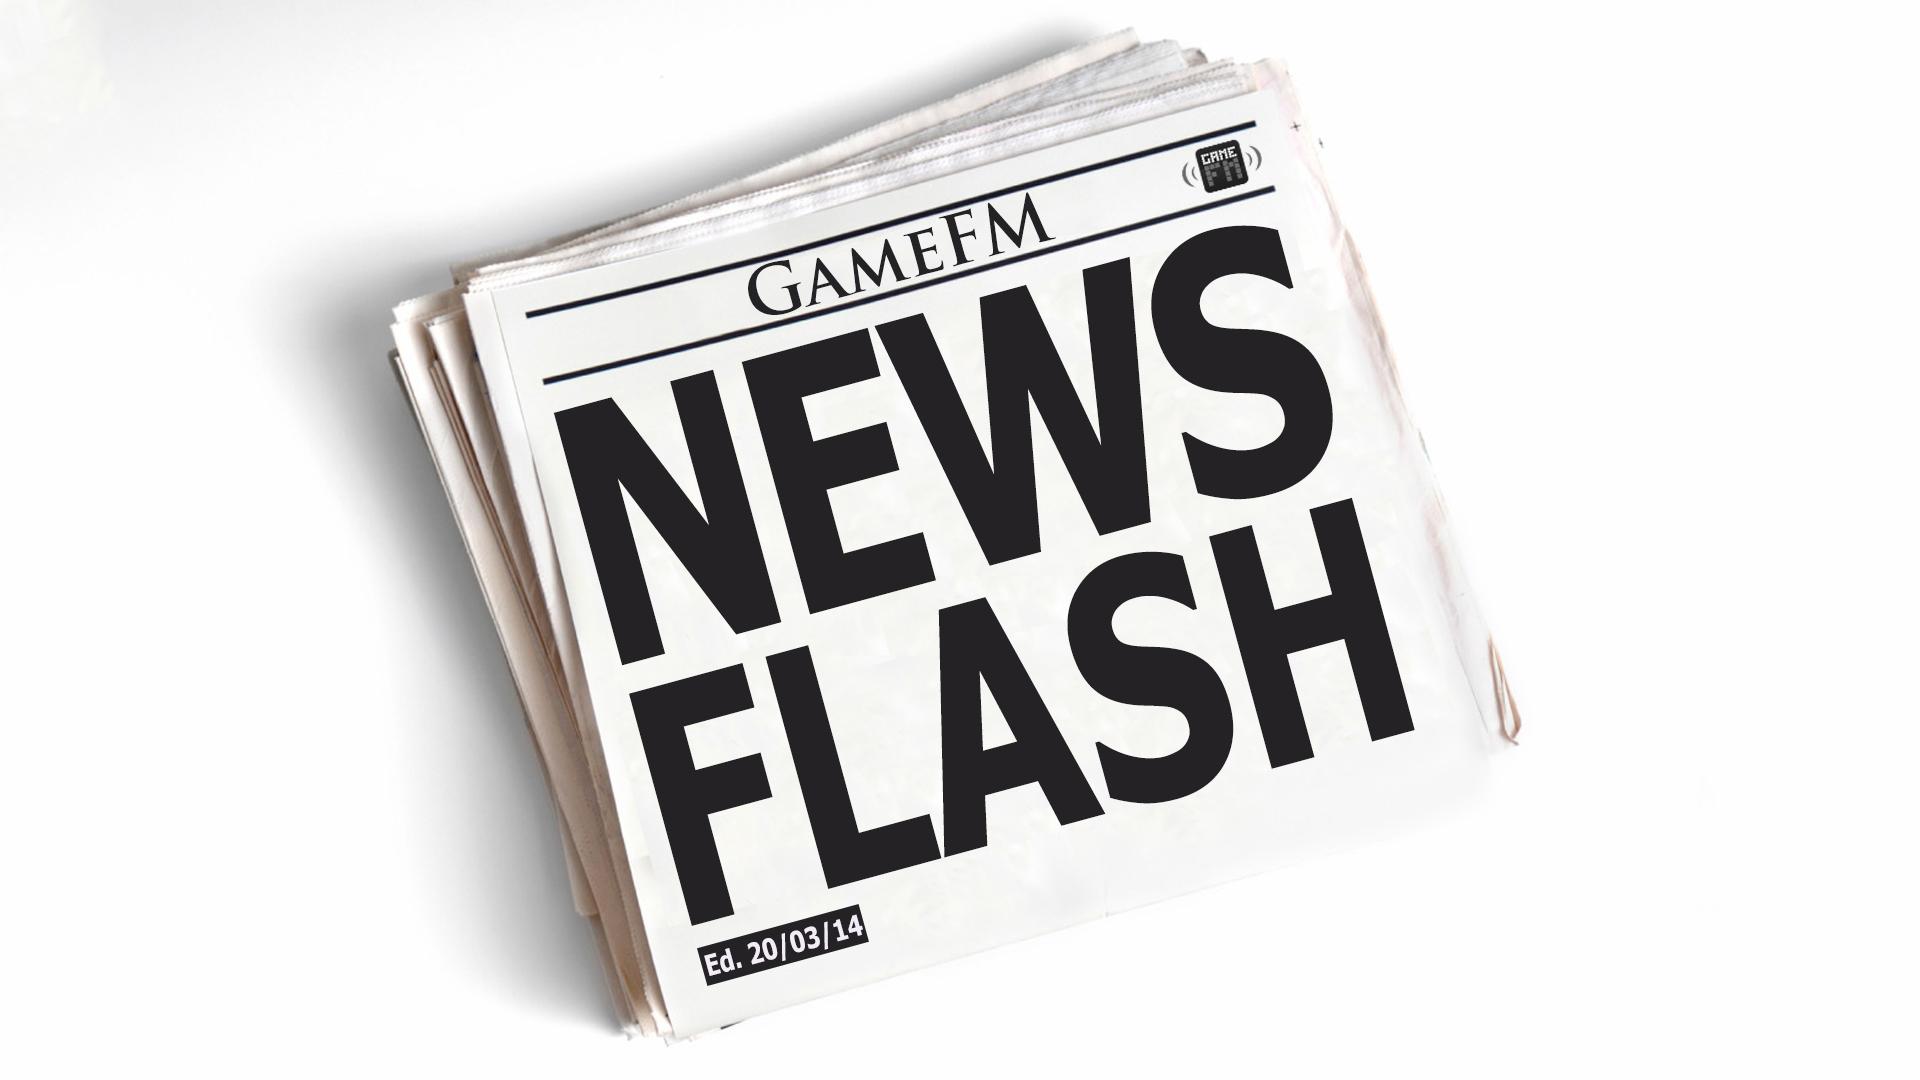 News Flash Clipart